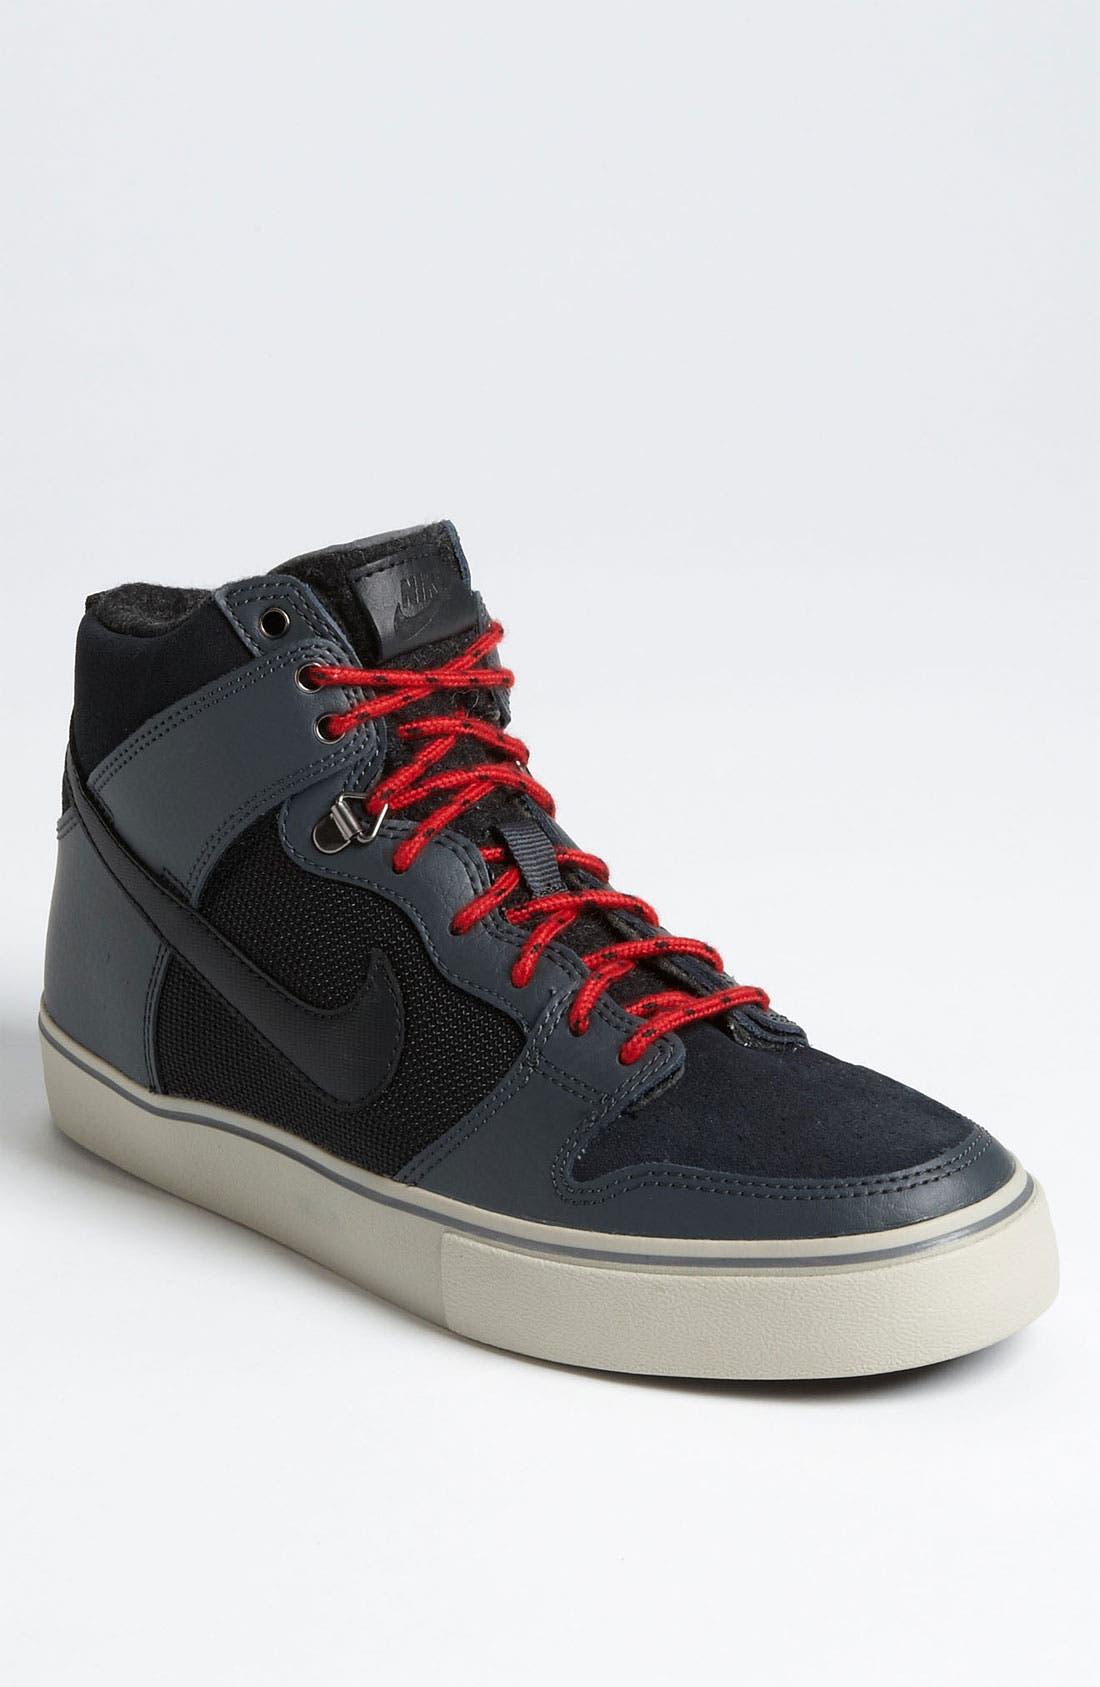 Alternate Image 1 Selected - Nike 'Dunk High LR' Sneaker (Men) (Online Only)